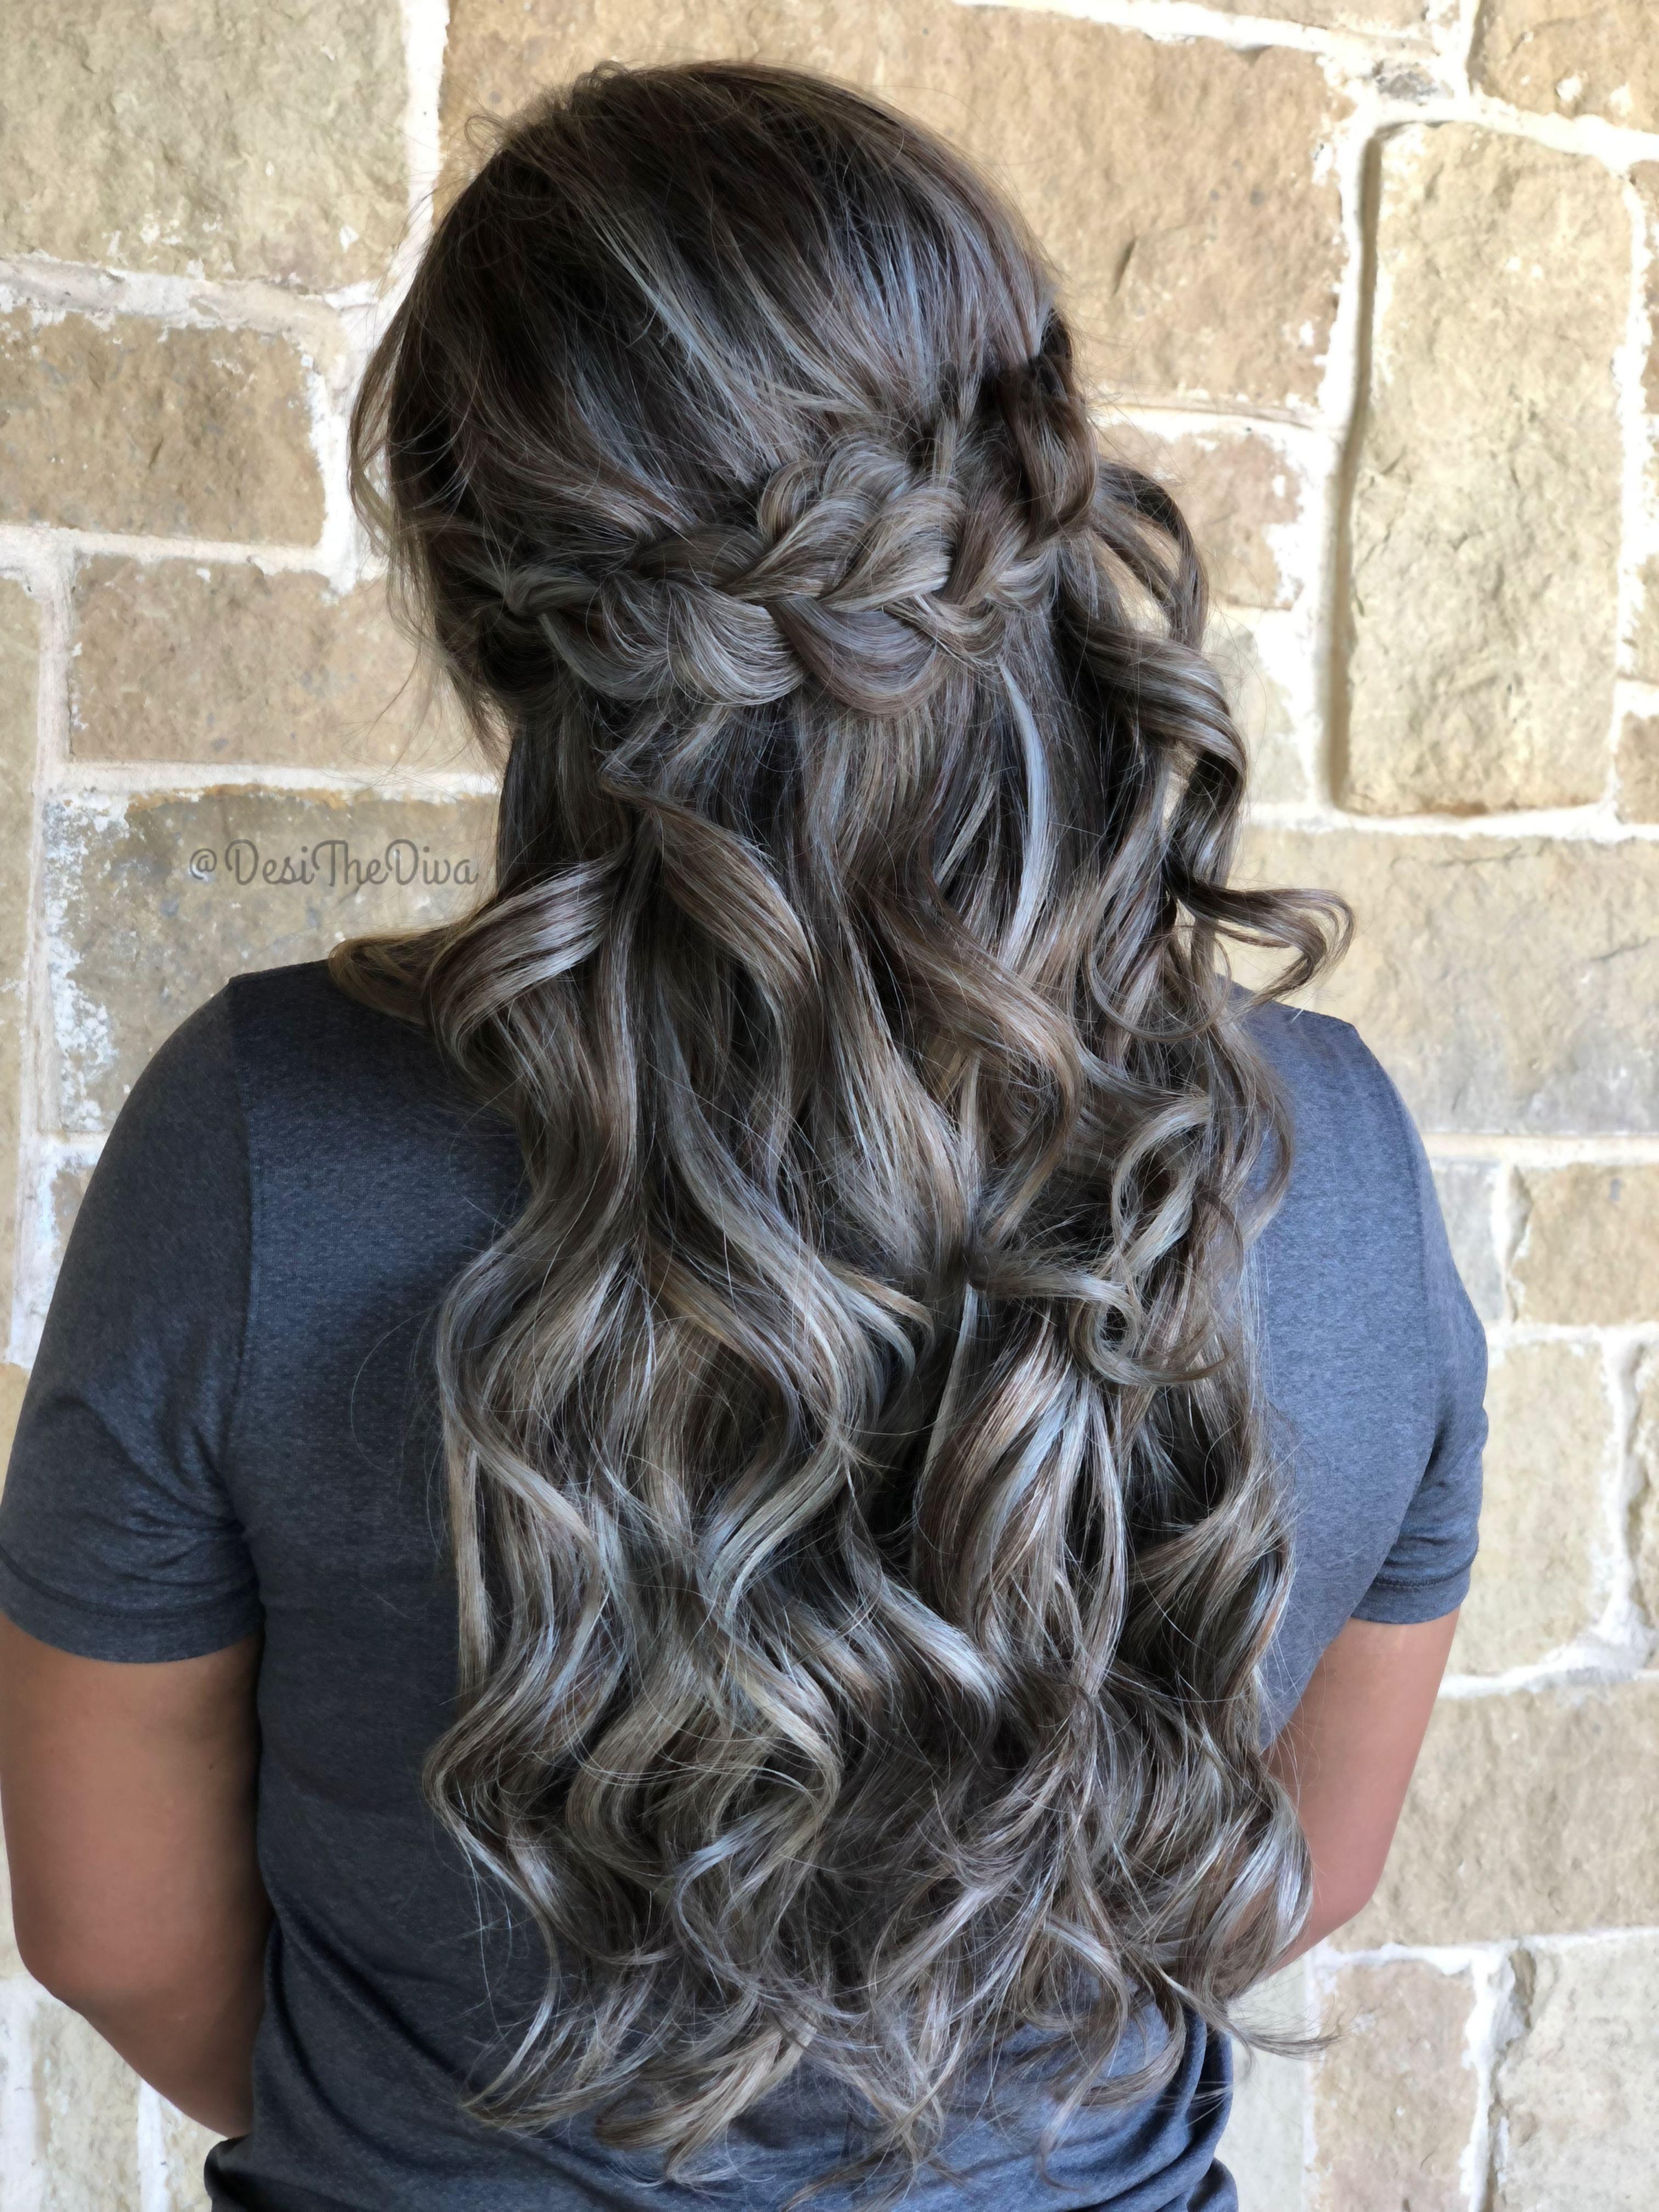 Grey hair hair styles wedding hairstyles wedding hair